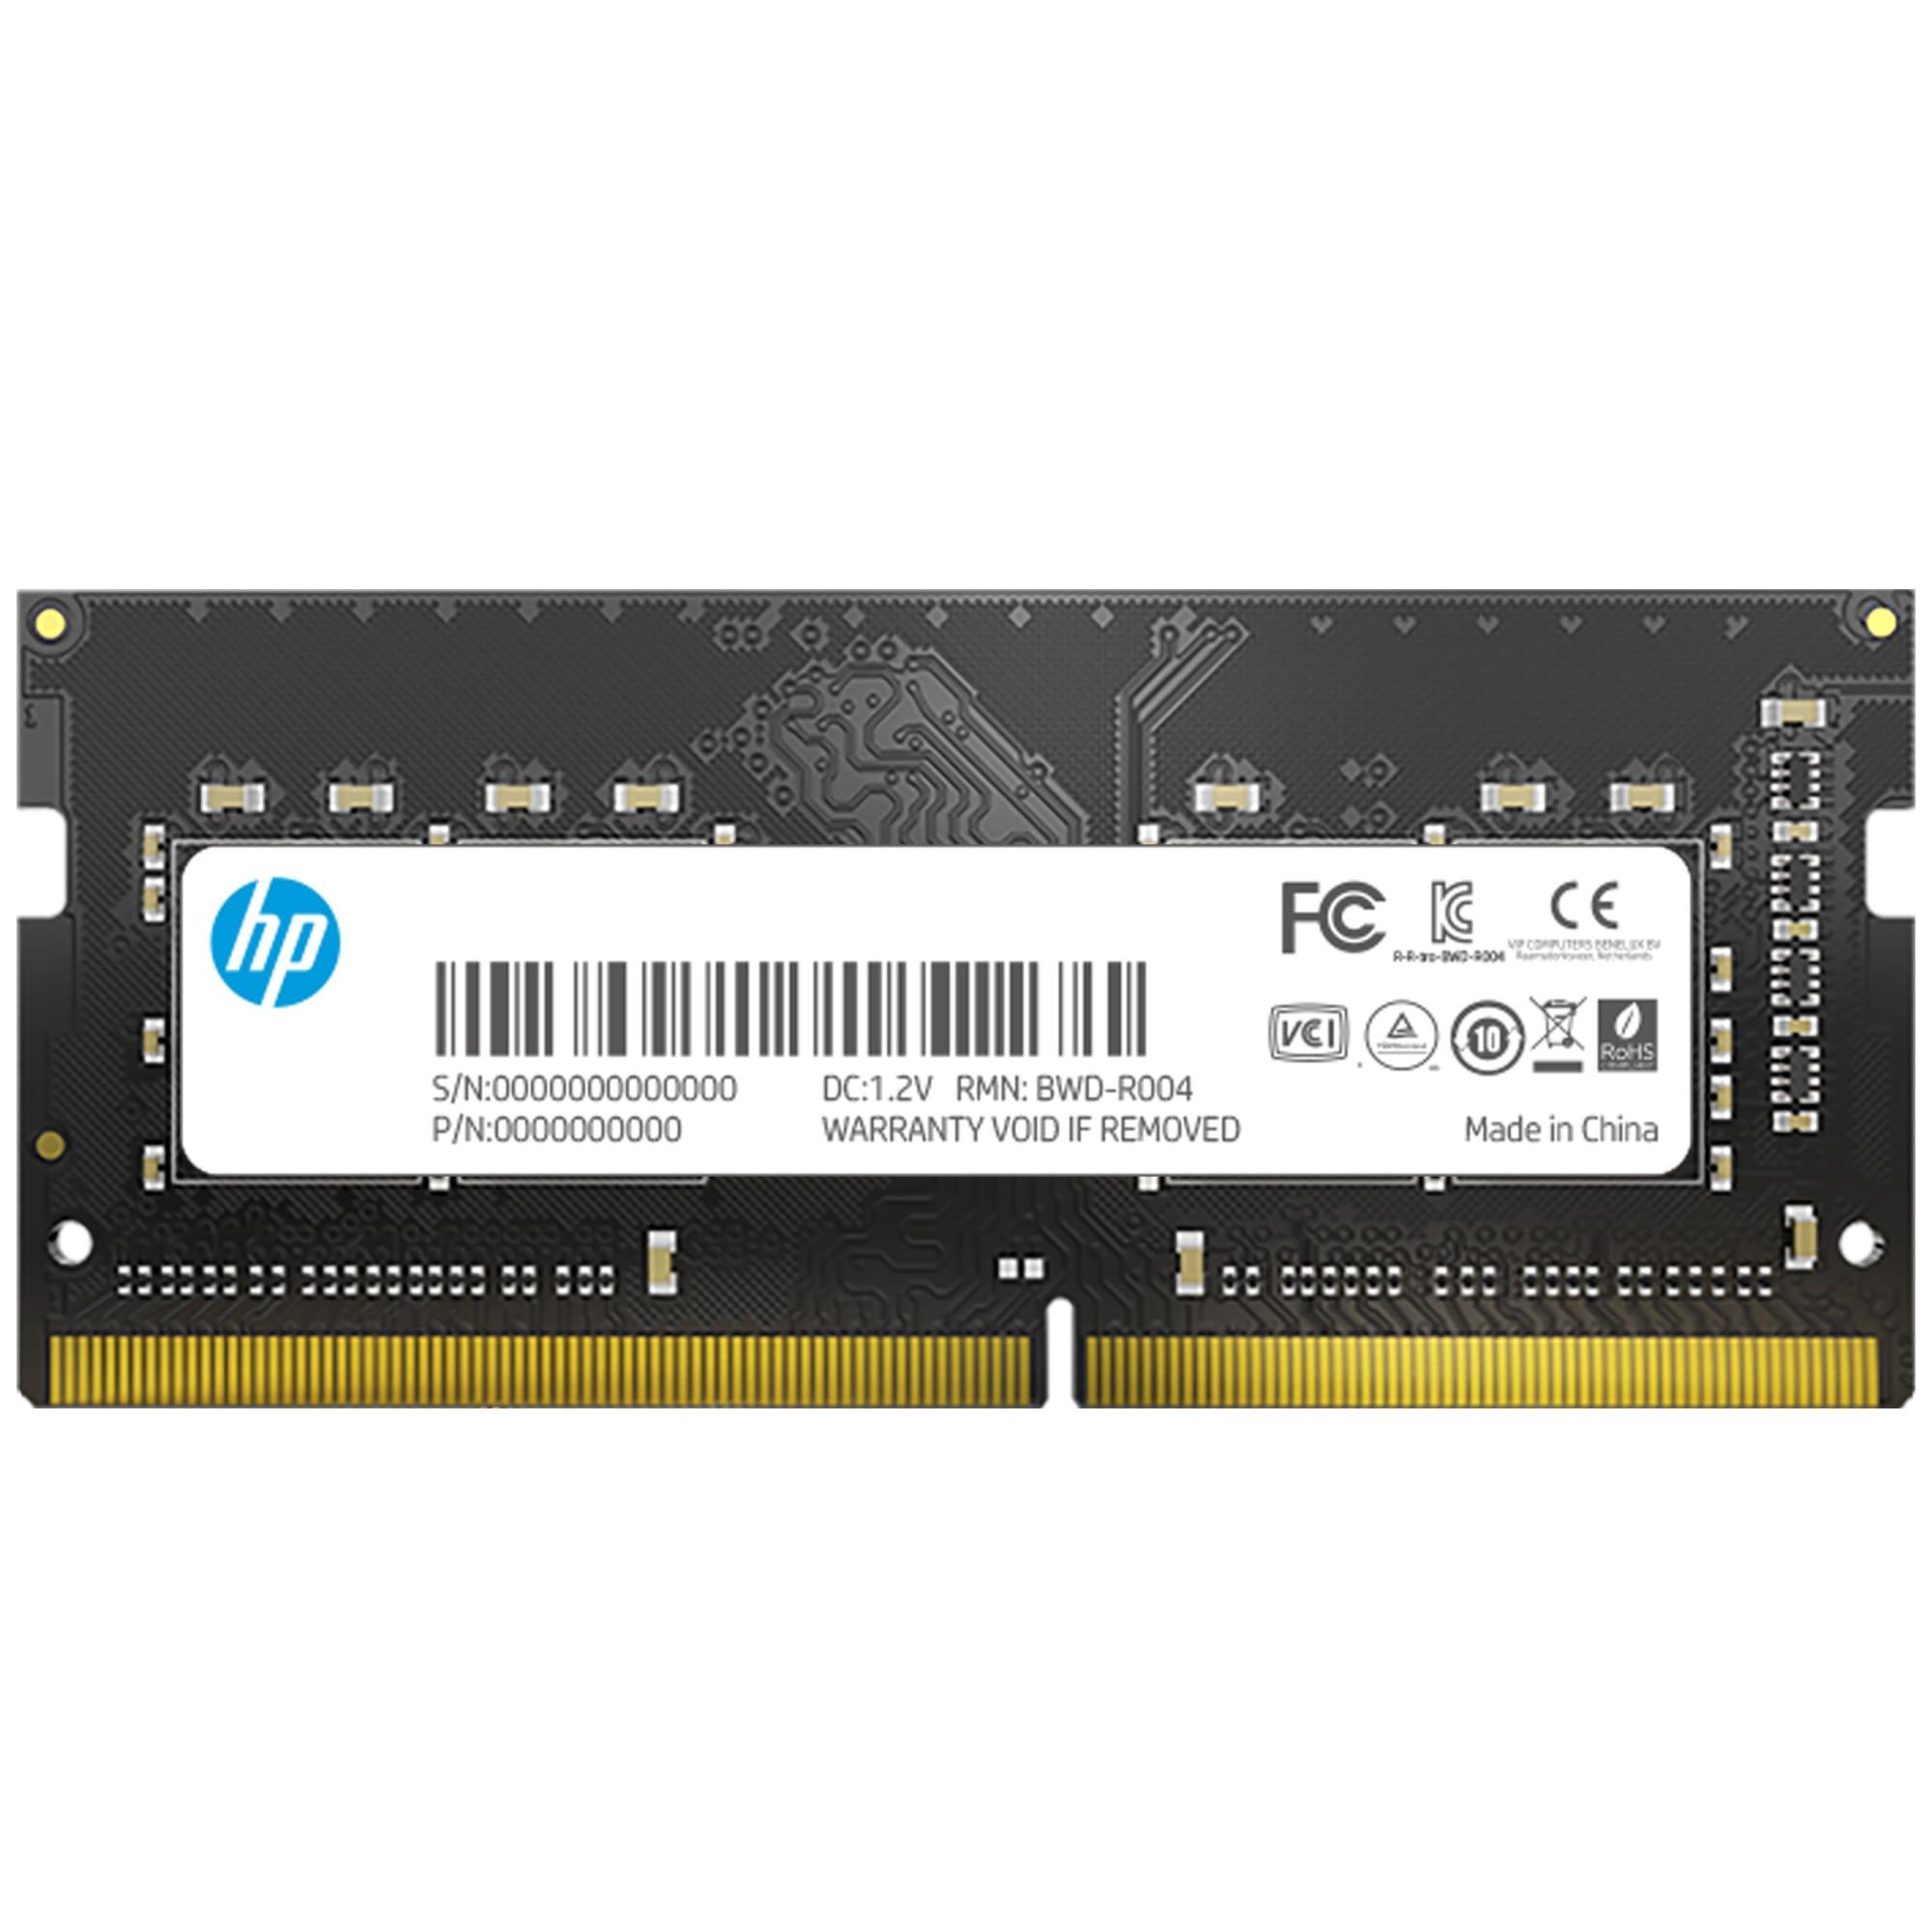 Fotografie Memorie Laptop HP S1 Series, 4GB DDR4, 2666MHz CL19